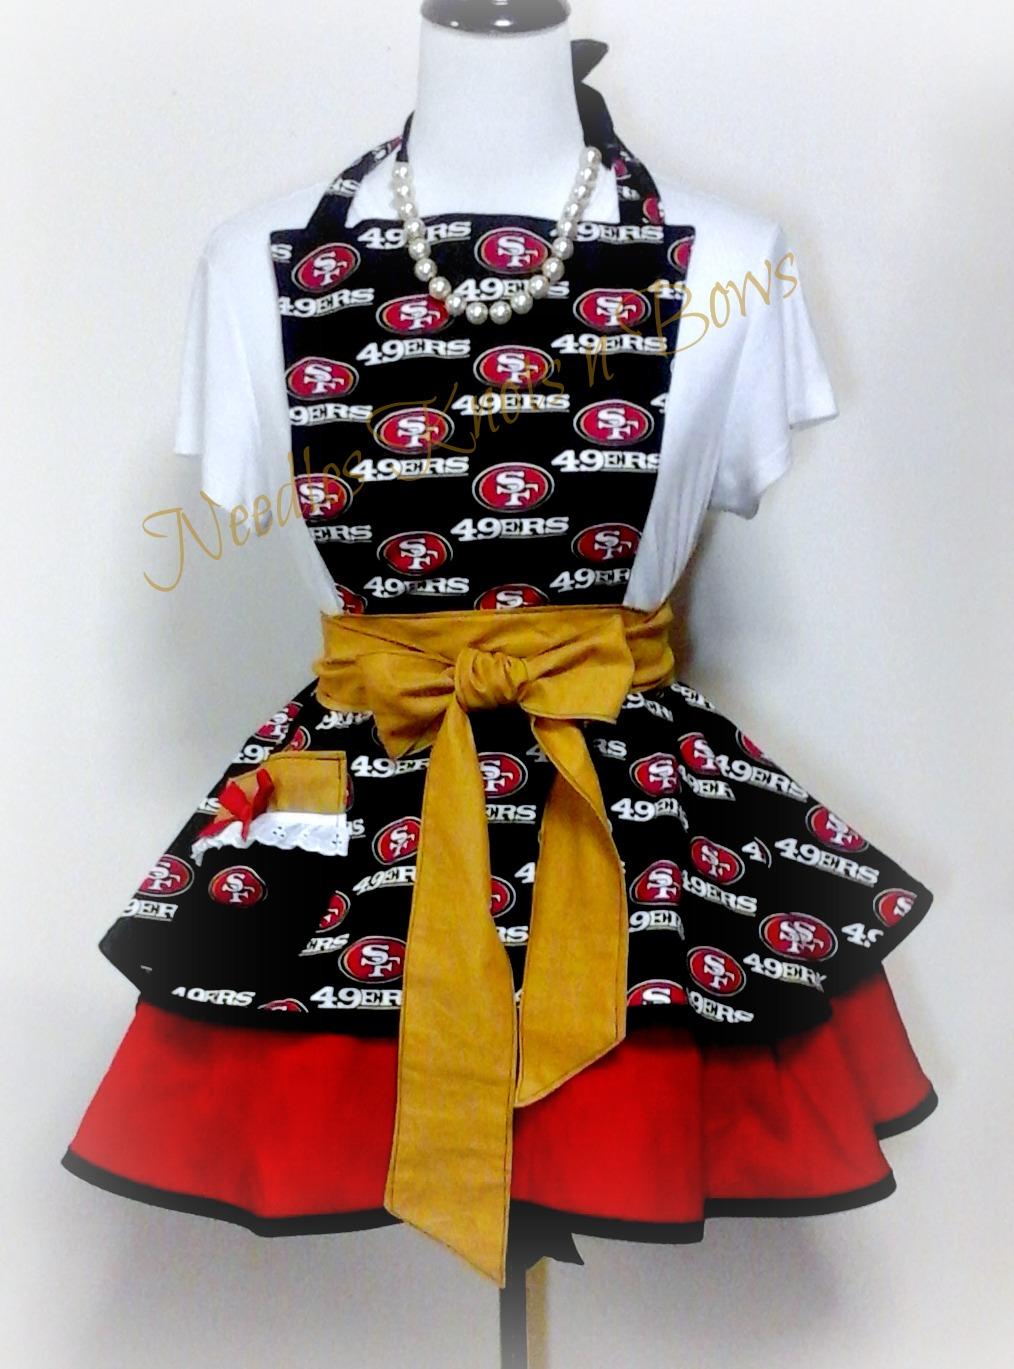 6b75899e San Francisco 49ers Womens Apron, Womens Forty Niners Apron, Football,  Aprons